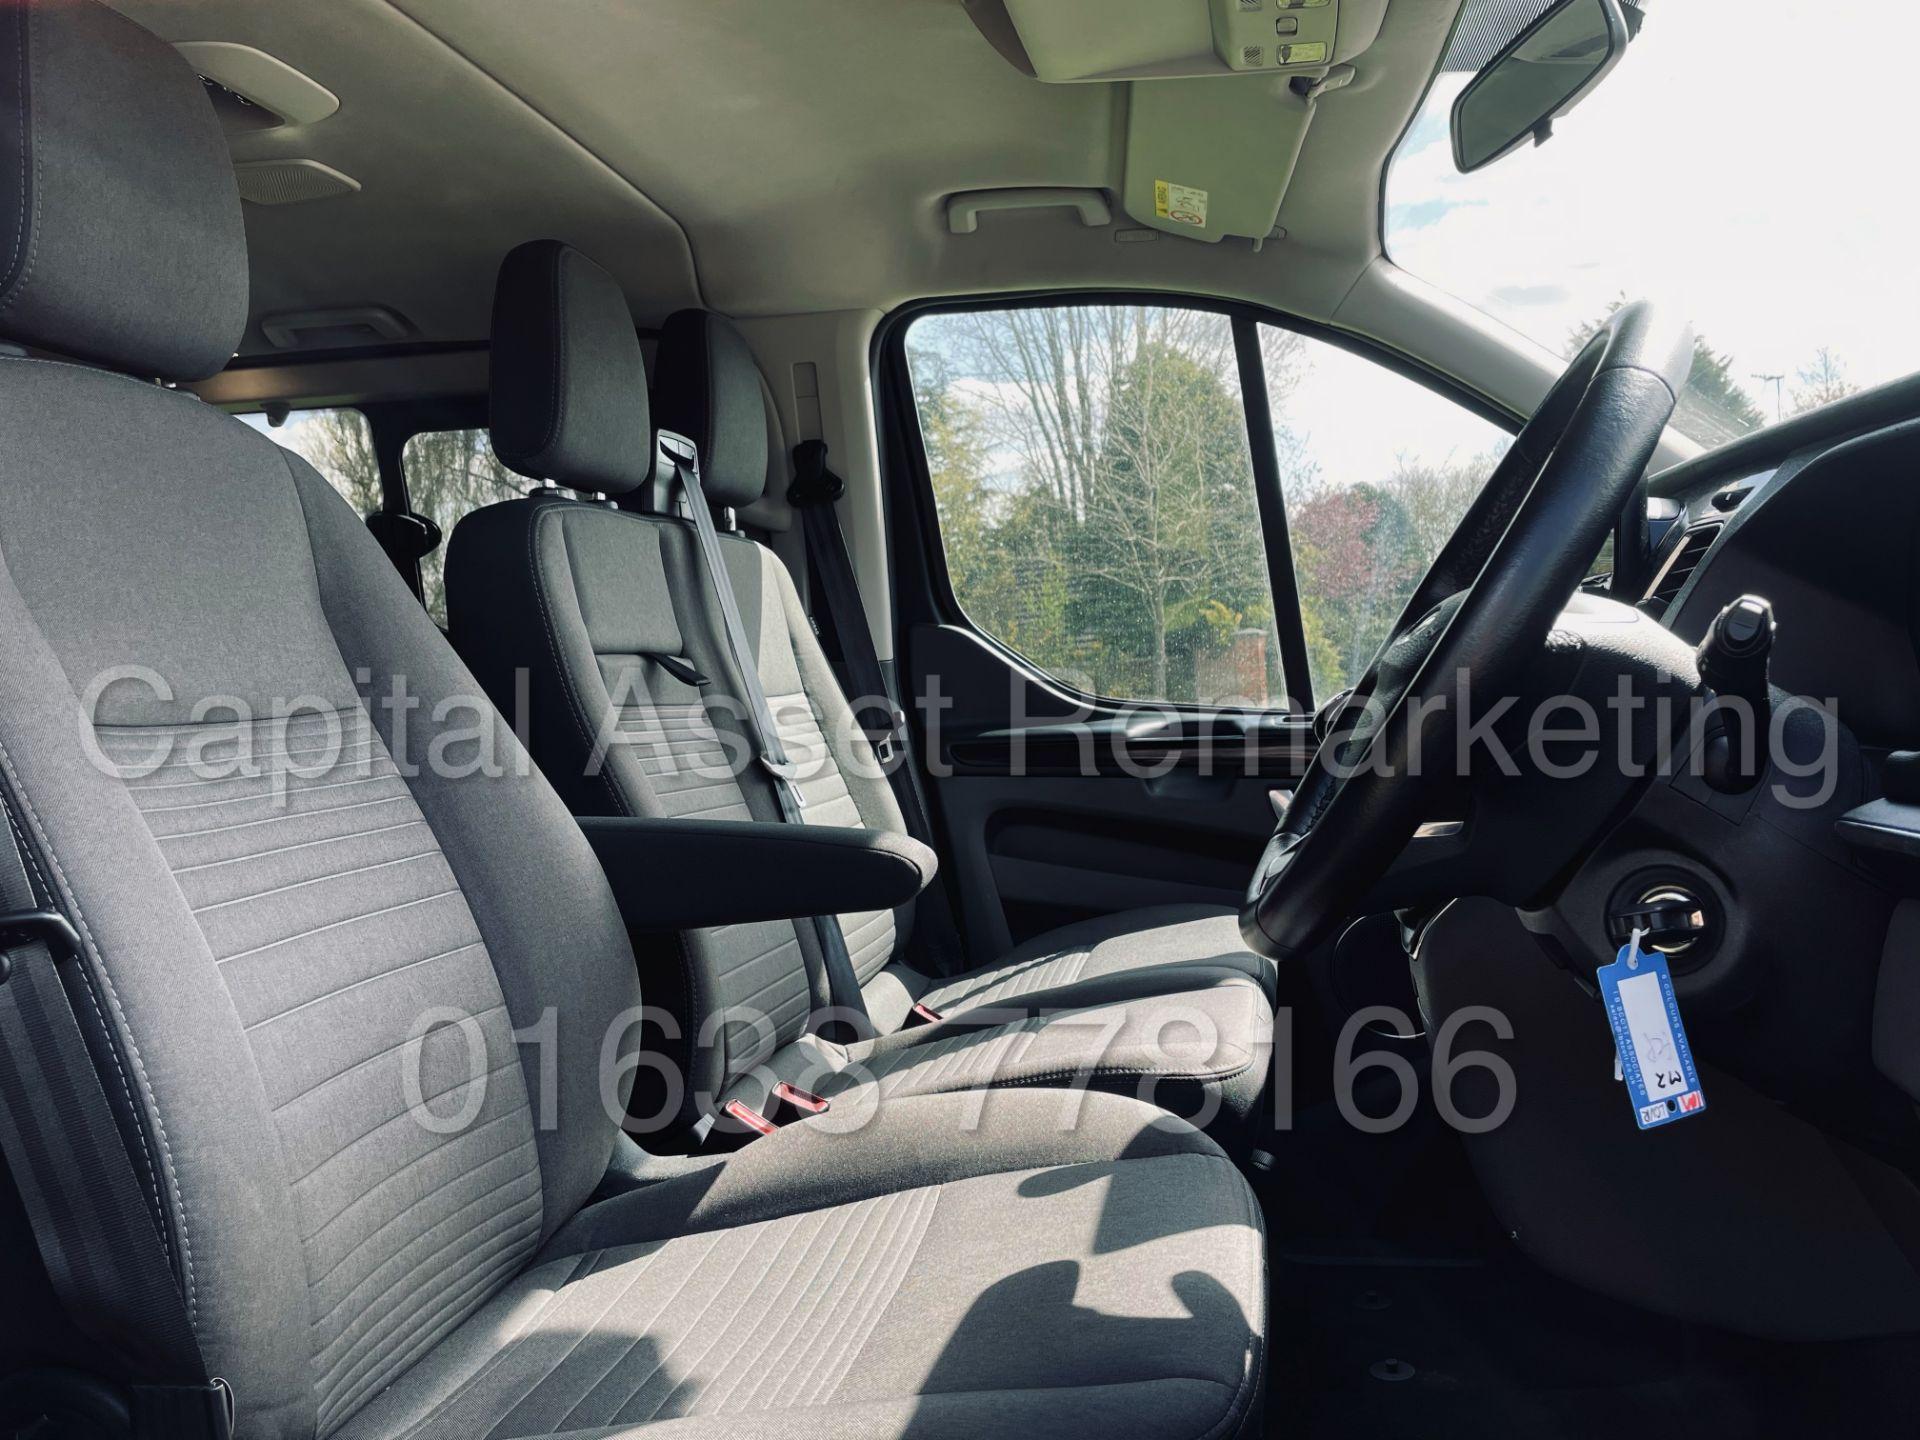 FORD TRANSIT CUSTOM TOURNEO *TITANIUM - 9 SEATER MPV / BUS* (2019 - EURO 6) '2.0 TDCI' *SAT NAV* - Image 39 of 56